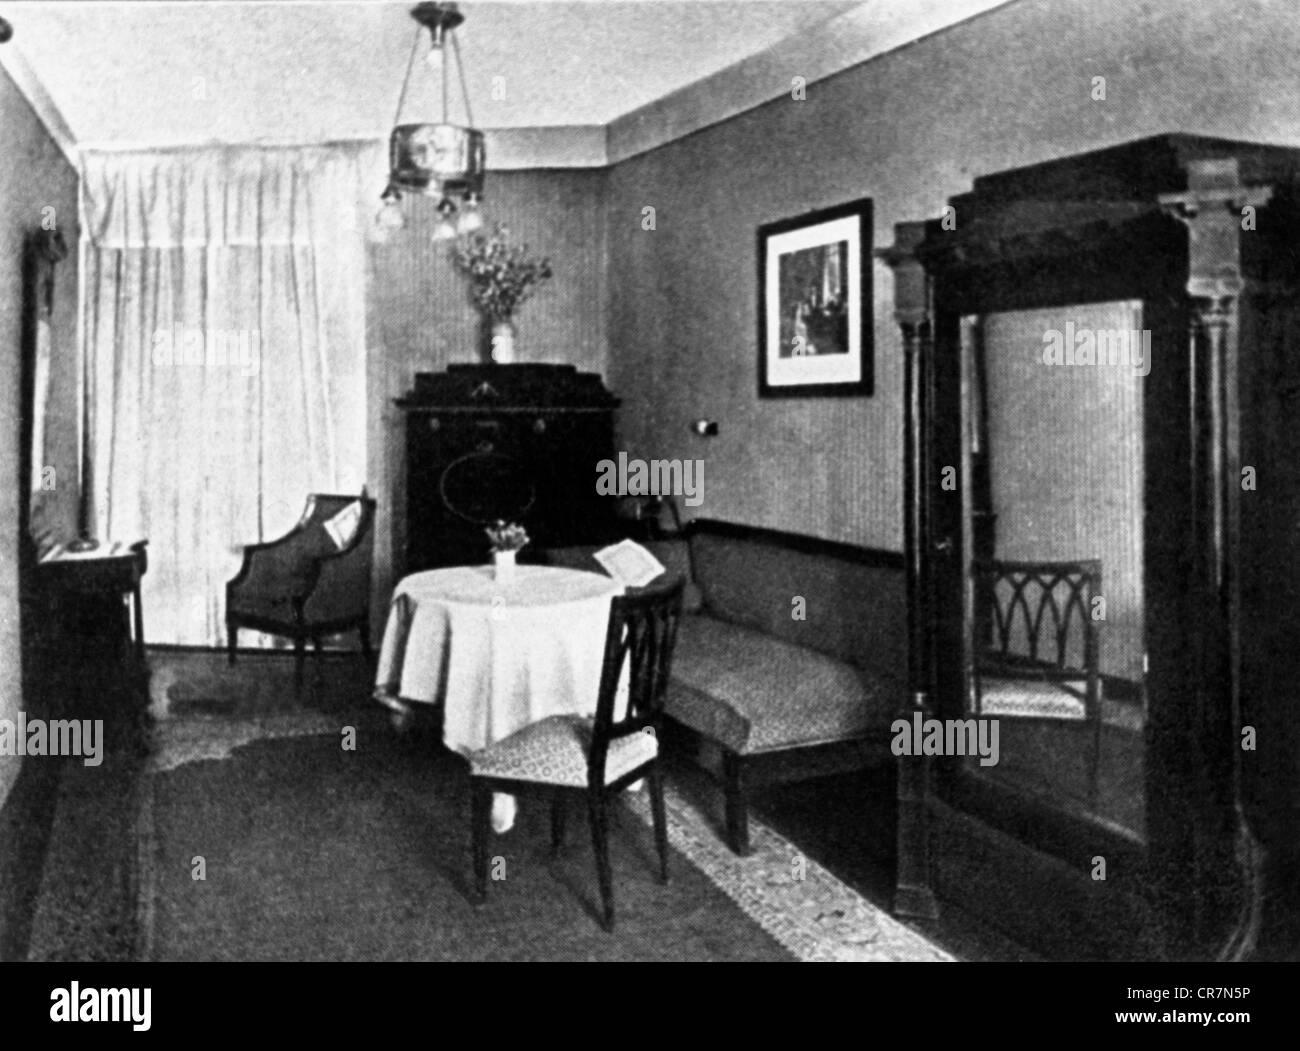 Wagner, Richard, 22.5.1813 - 13.2.1883, German composer, Richard, Wagner room, Hotel Erbprinz, Weimar, 19th century, - Stock Image